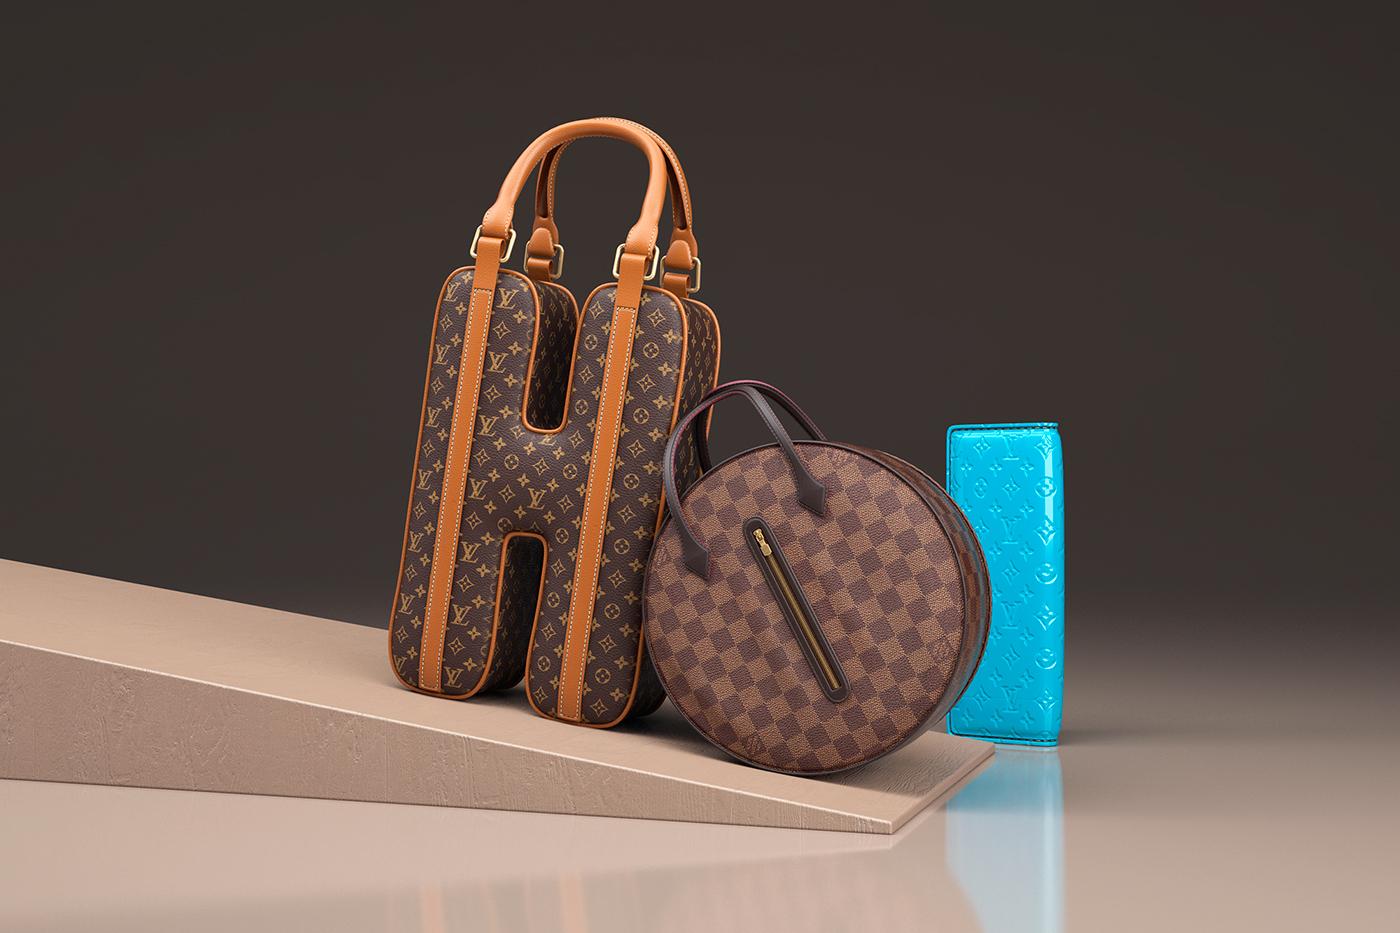 Louis vuitton bags letters CGI 3D Type 3D typography colour leather fabric design art